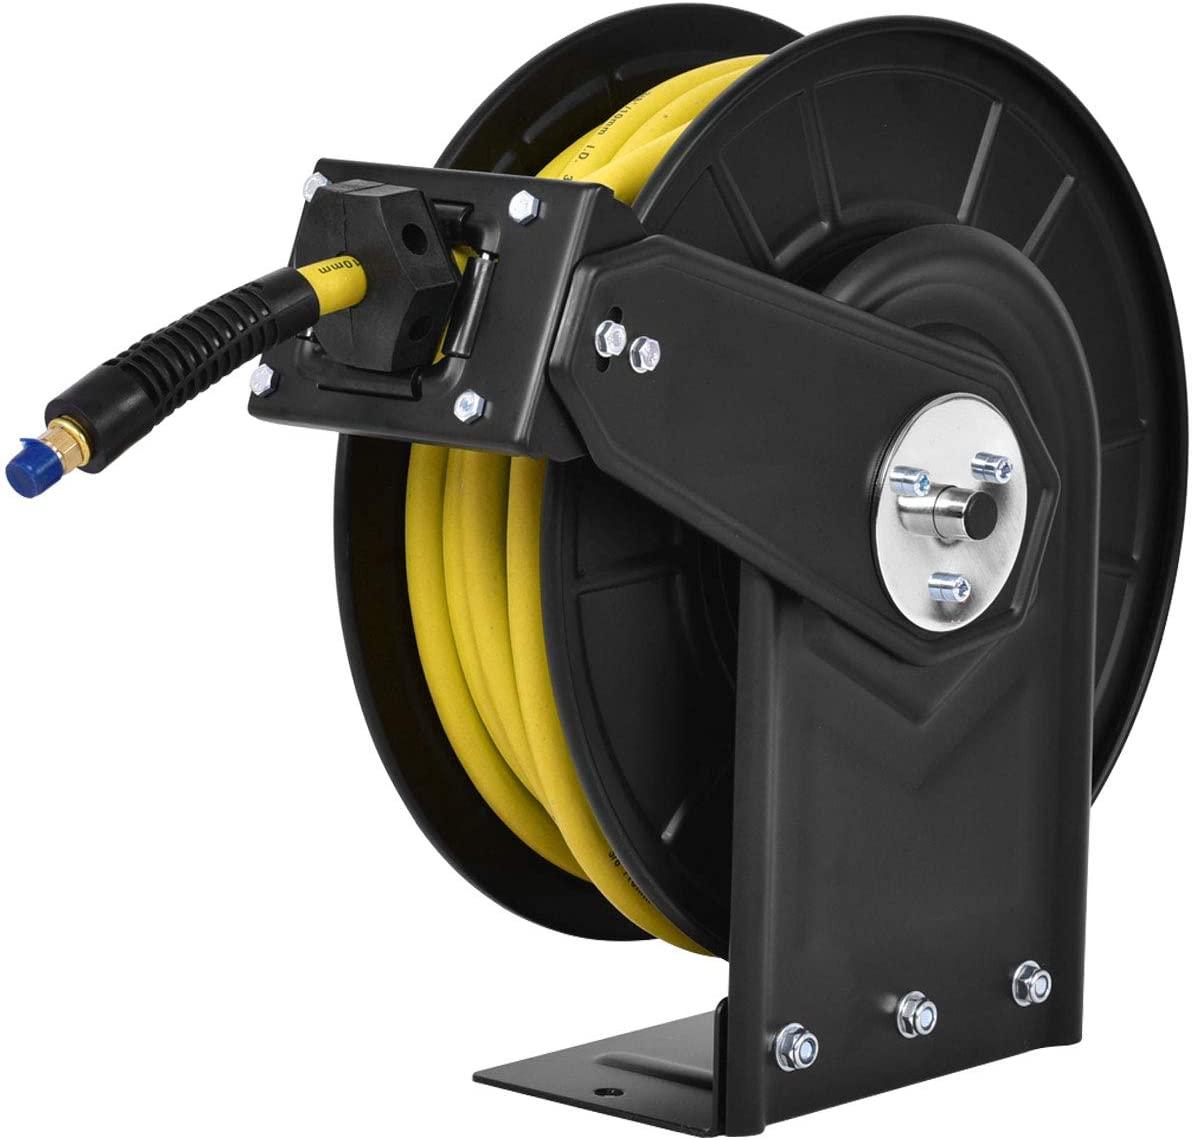 Goplus Air Hose Reel, Steel Compressor Hose Auto Rewind with Retractable 3/8